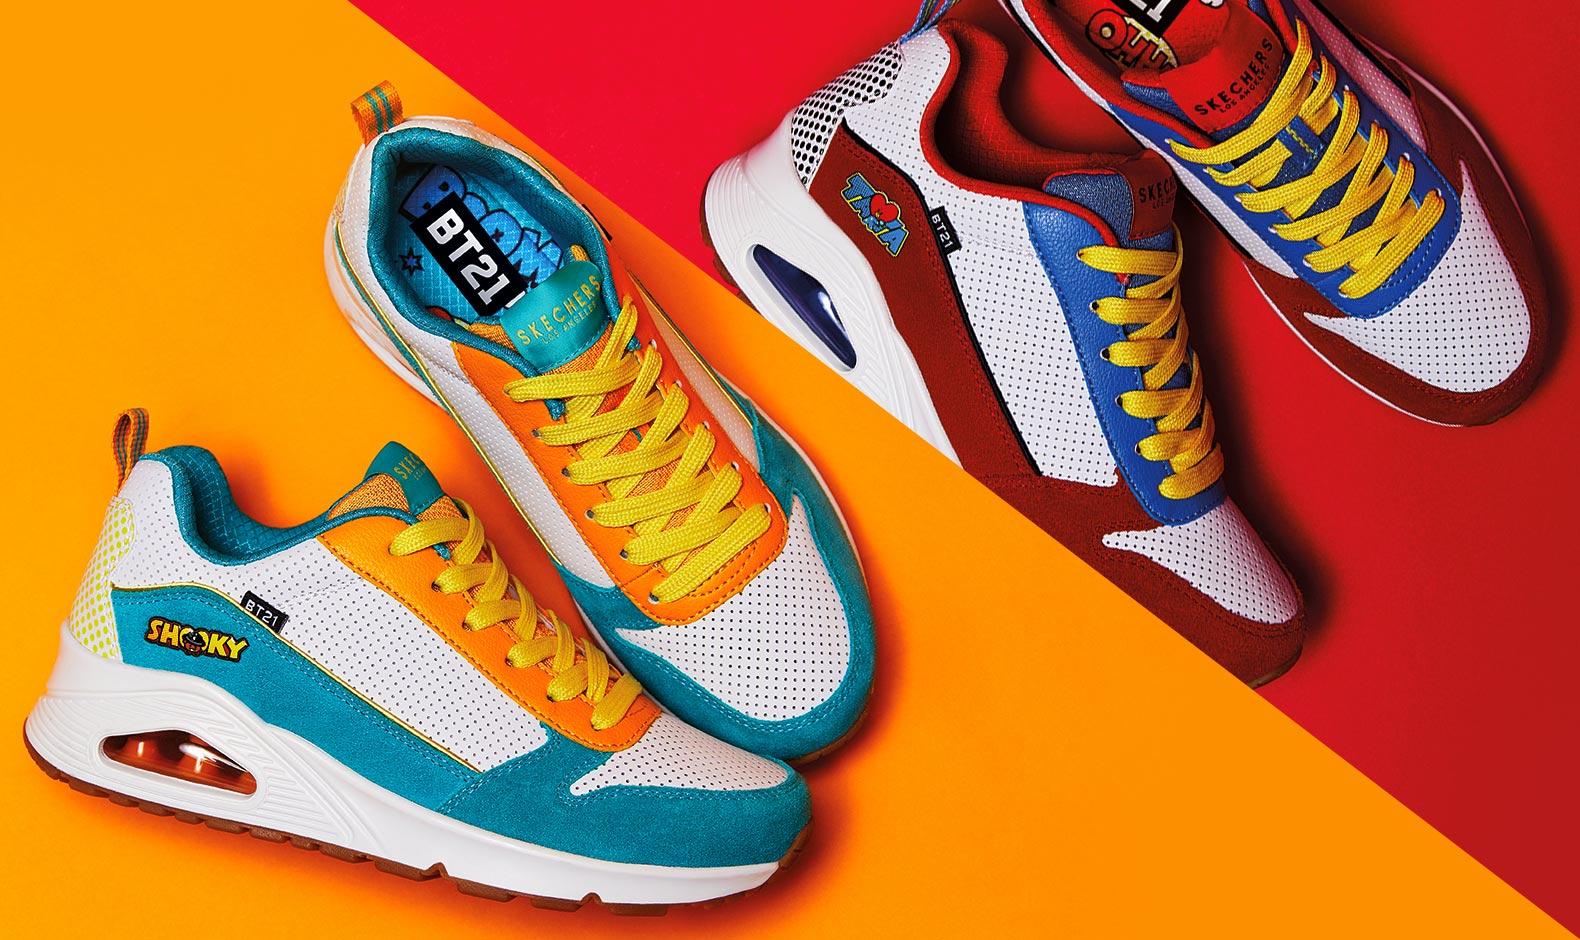 skechers shoes online sale india